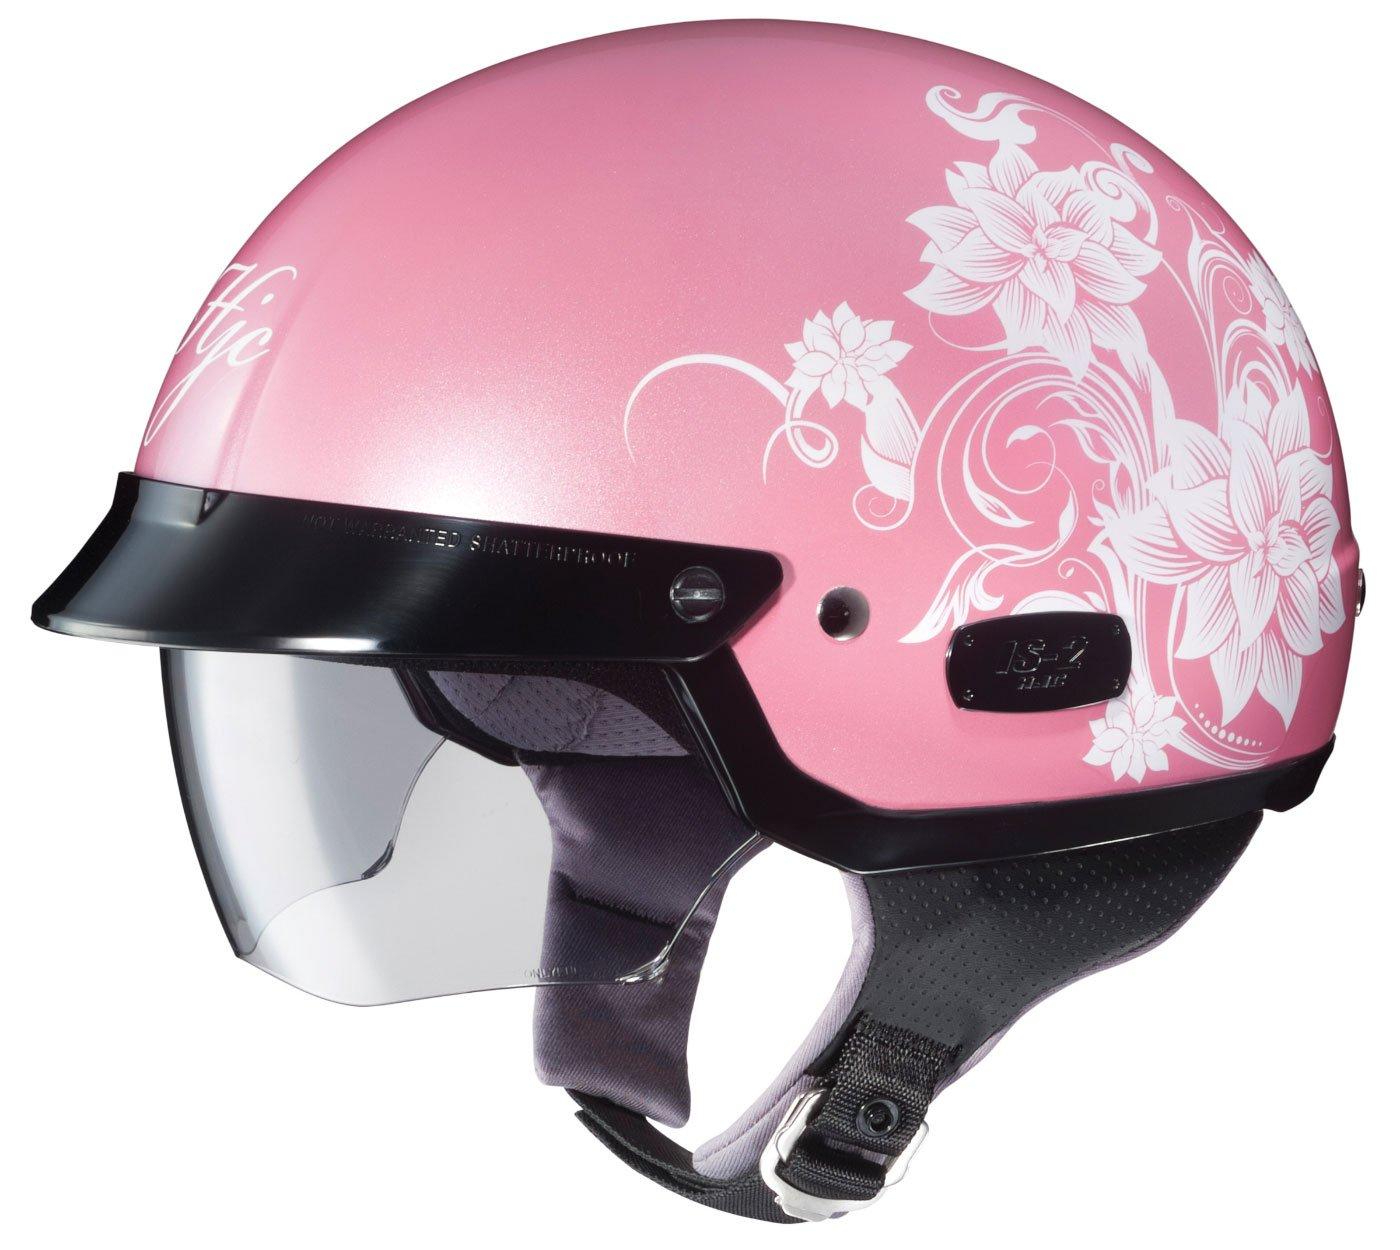 HJC IS-2 Blossom Motorcycle Half-Helmet 486-982 MC-8, Small